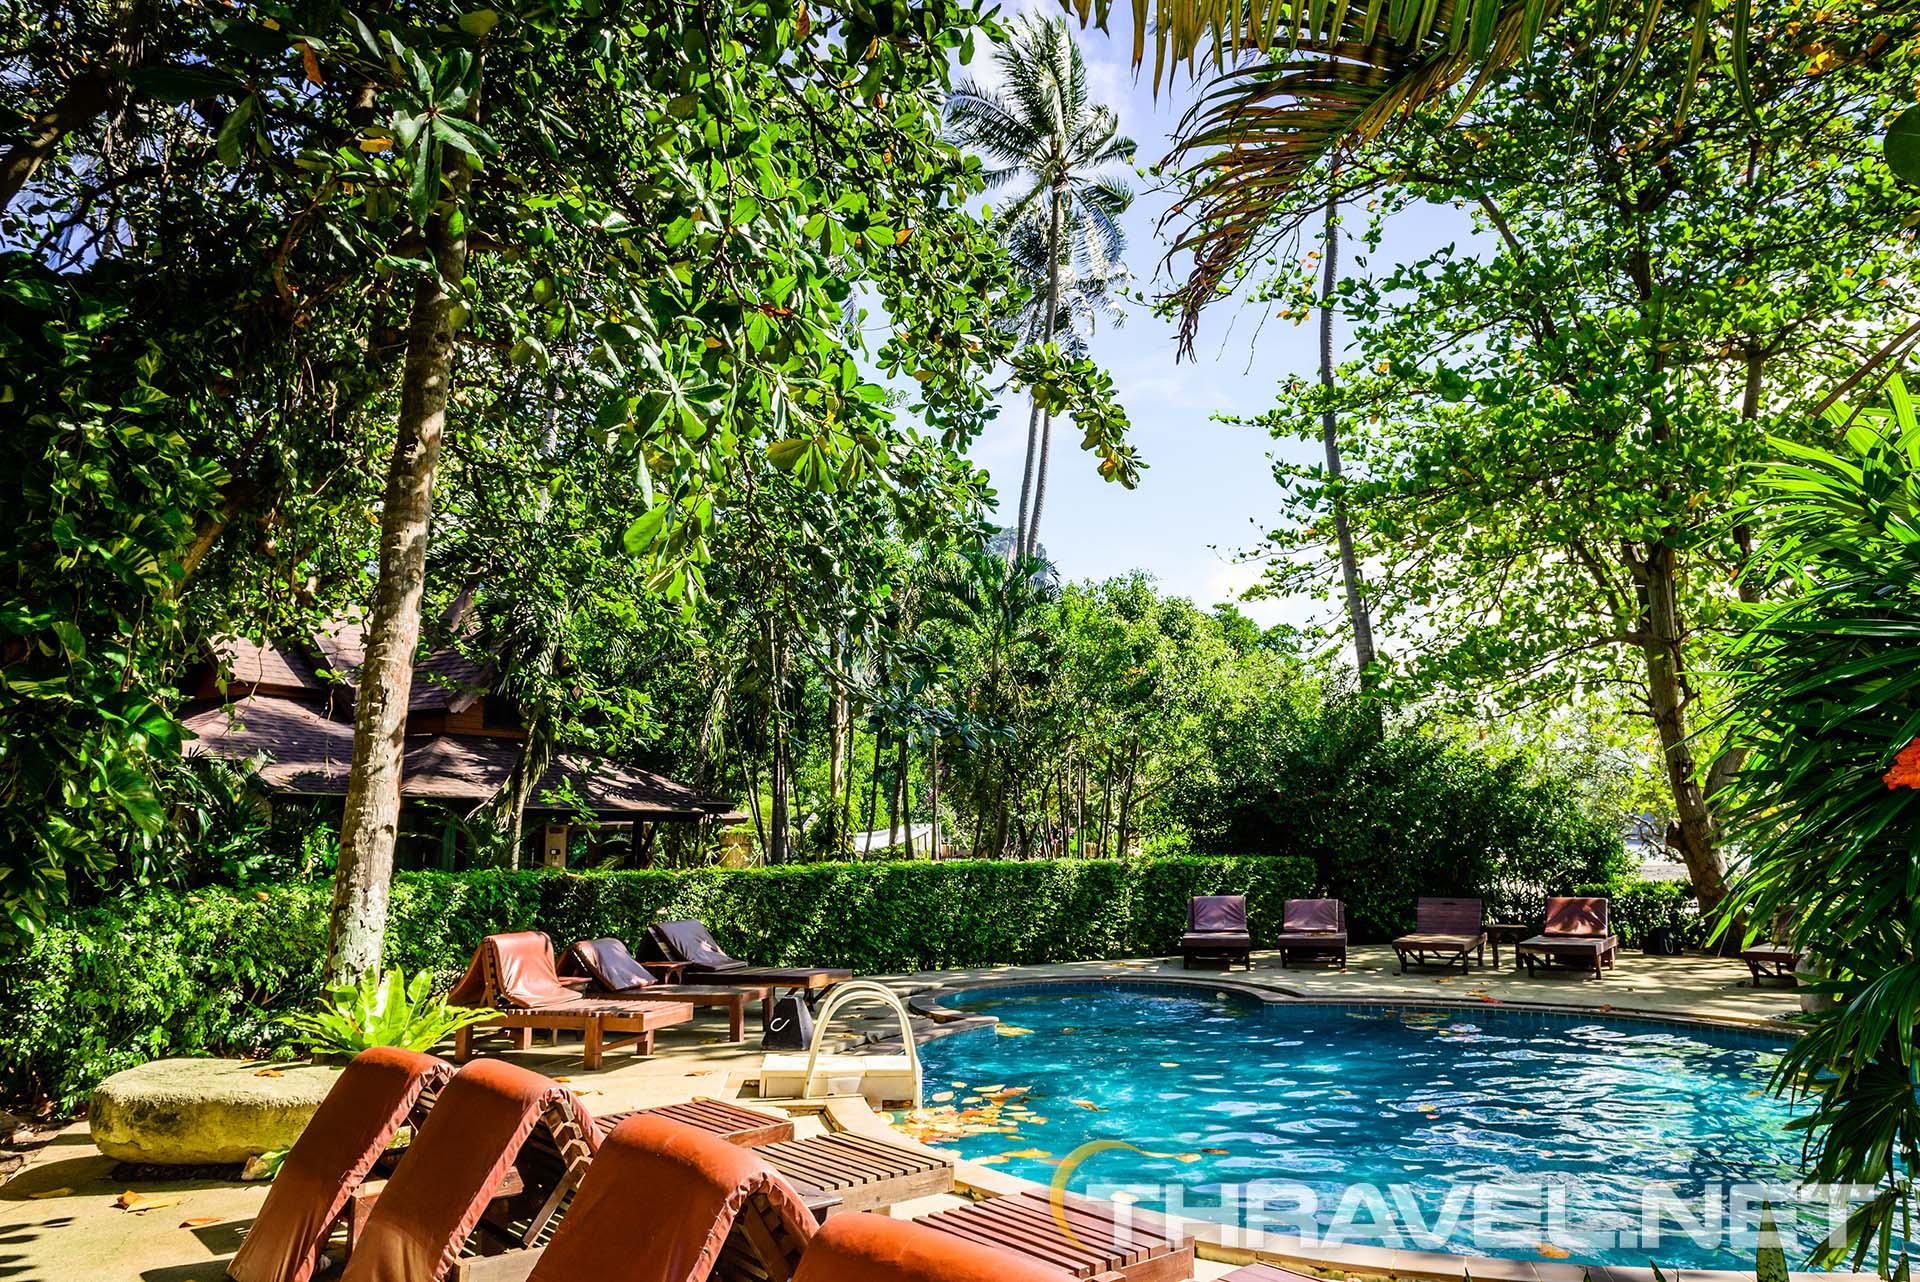 Sunset-Tropical-Resort-swimming-pool